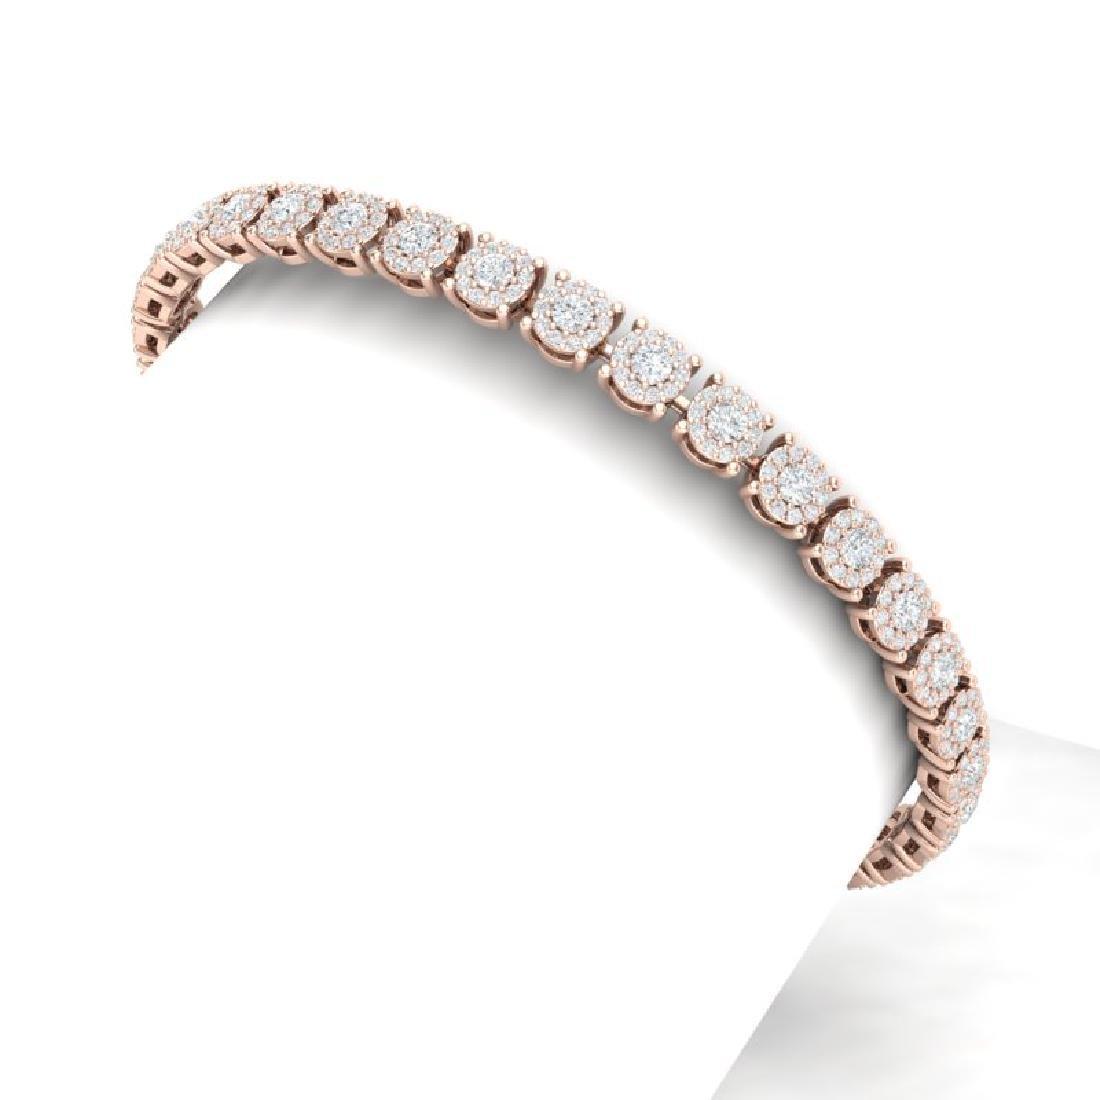 5 CTW Certified SI/I Diamond Halo Bracelet 18K Rose